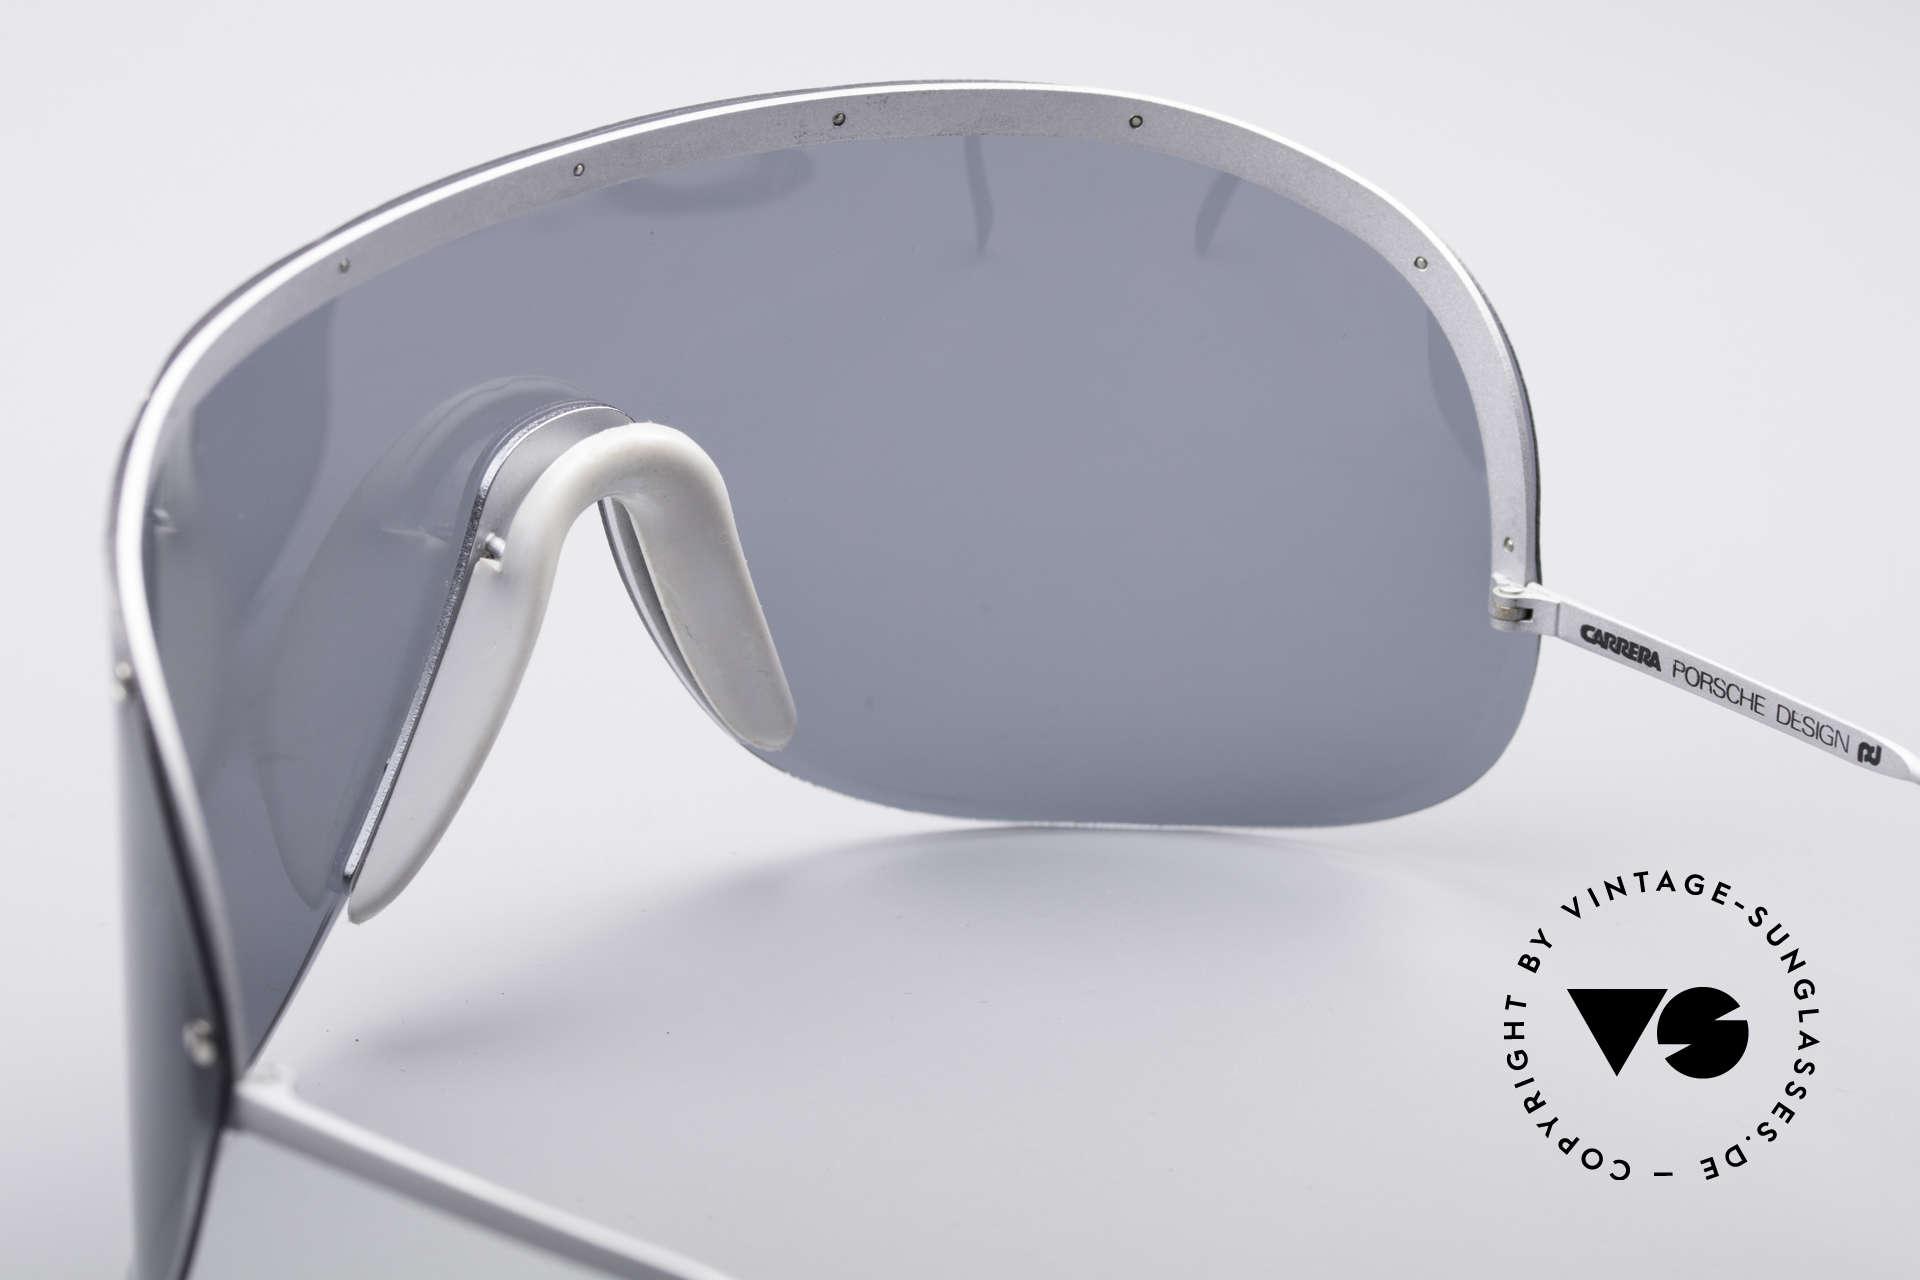 Porsche 5620 Original Yoko Ono Shades, originally produced as 'sports glasses' (polarized shades), Made for Men and Women